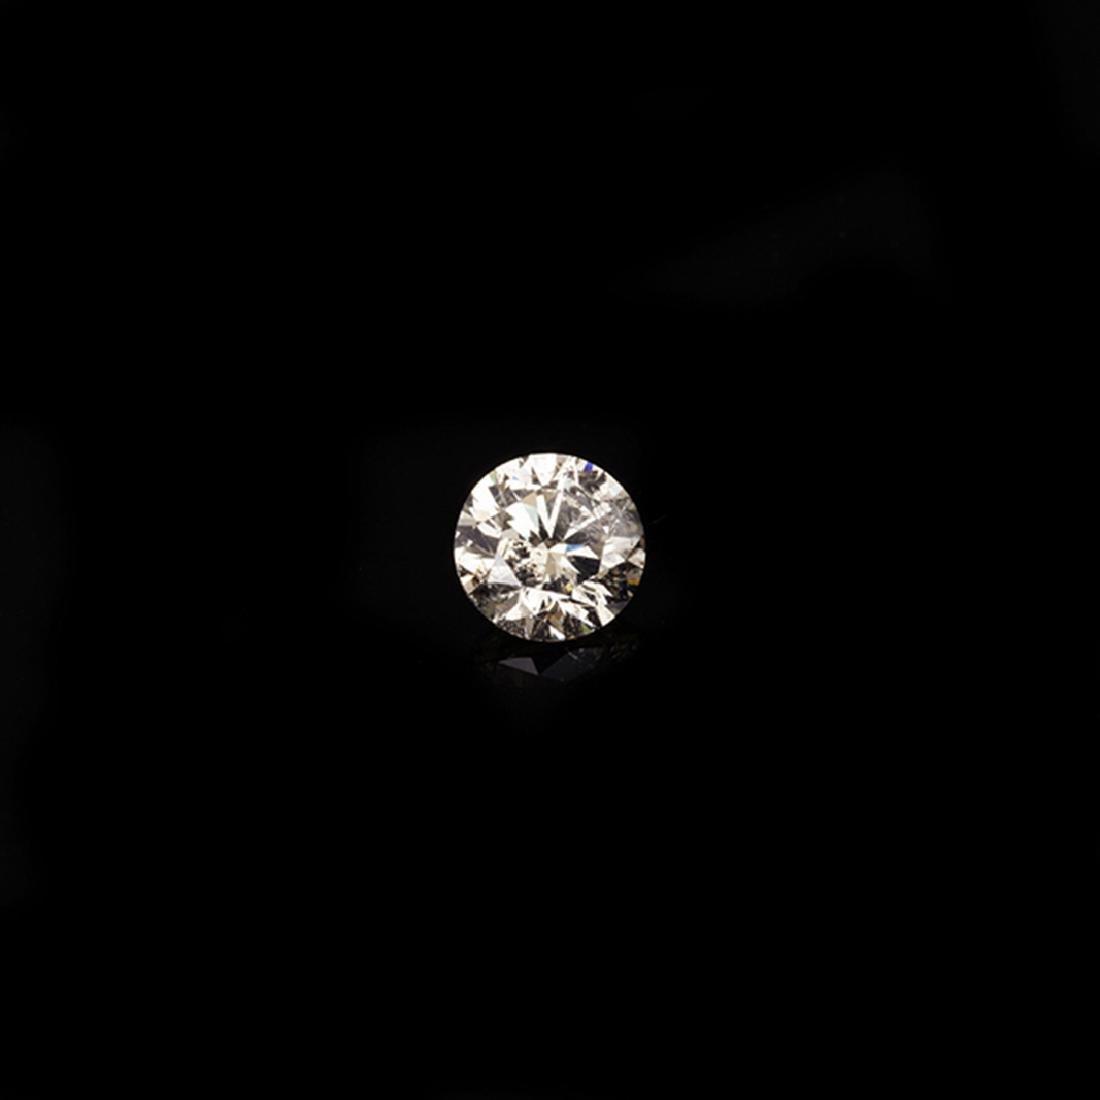 Fine Jewelry GIA Certified 0.31CT Brilliant Round Cut